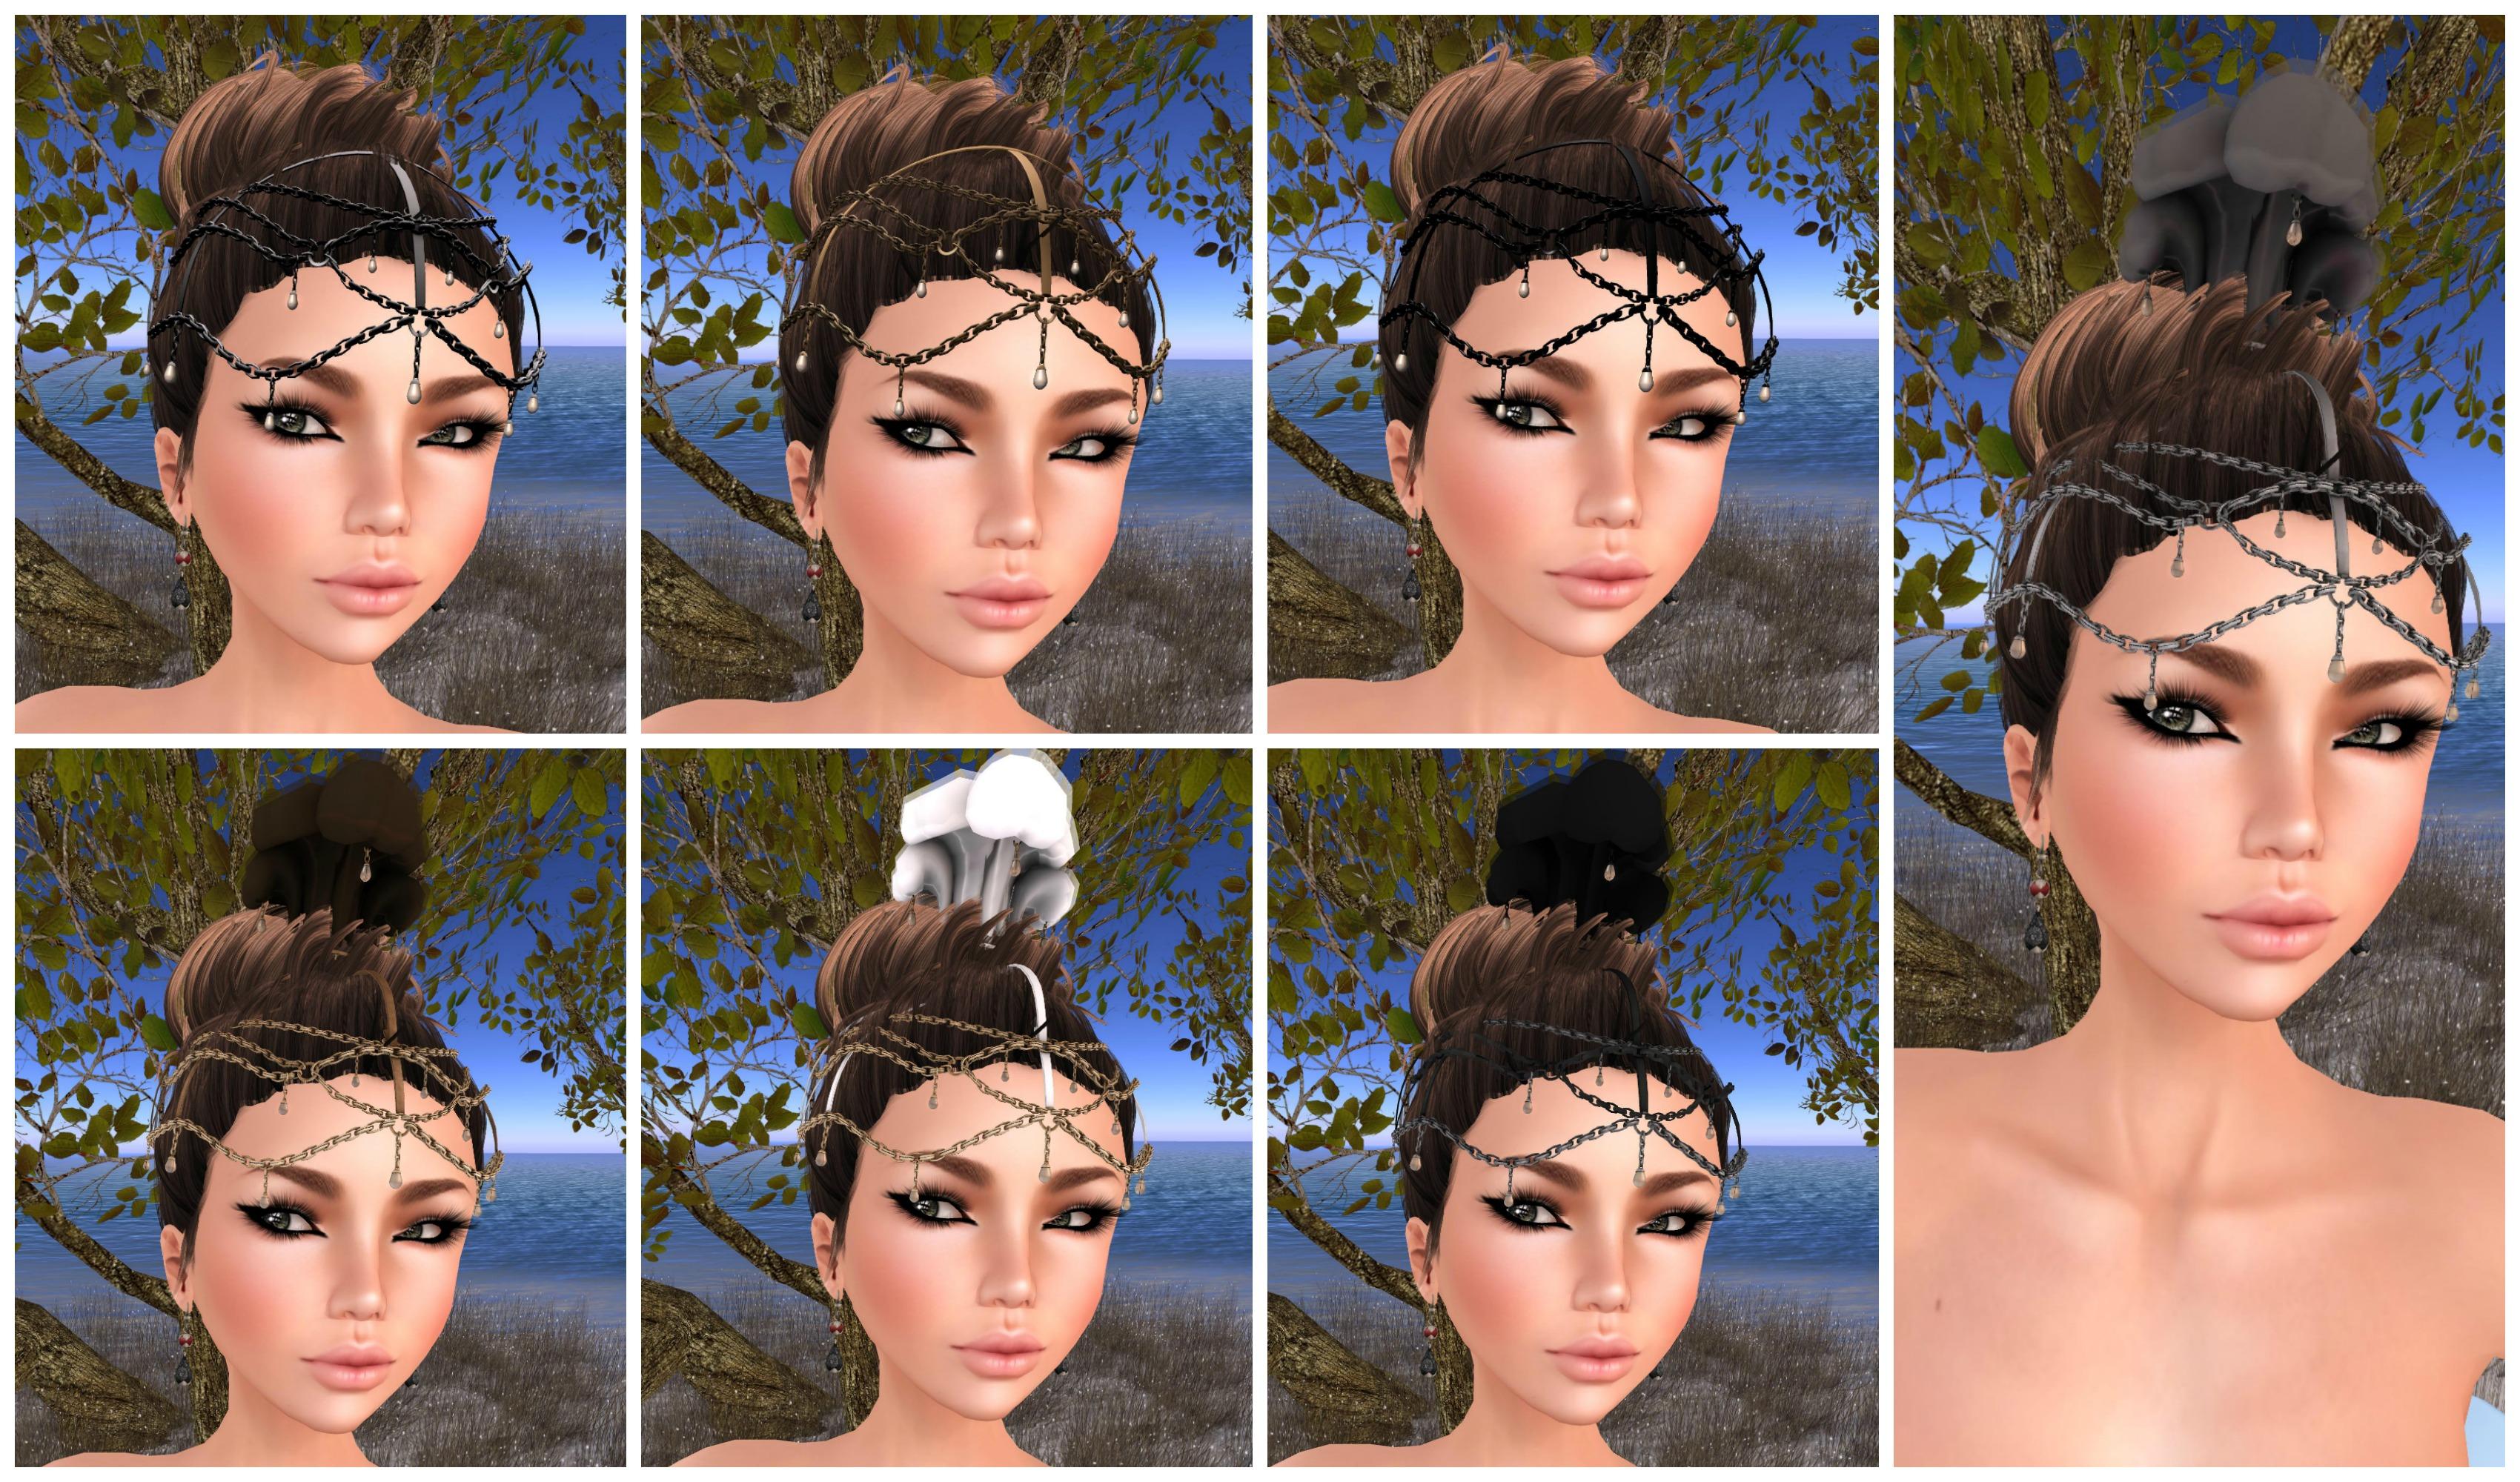 Fantasy Gacha Carnival H. 06 - GSpot & *OAL* & OrsiniSu